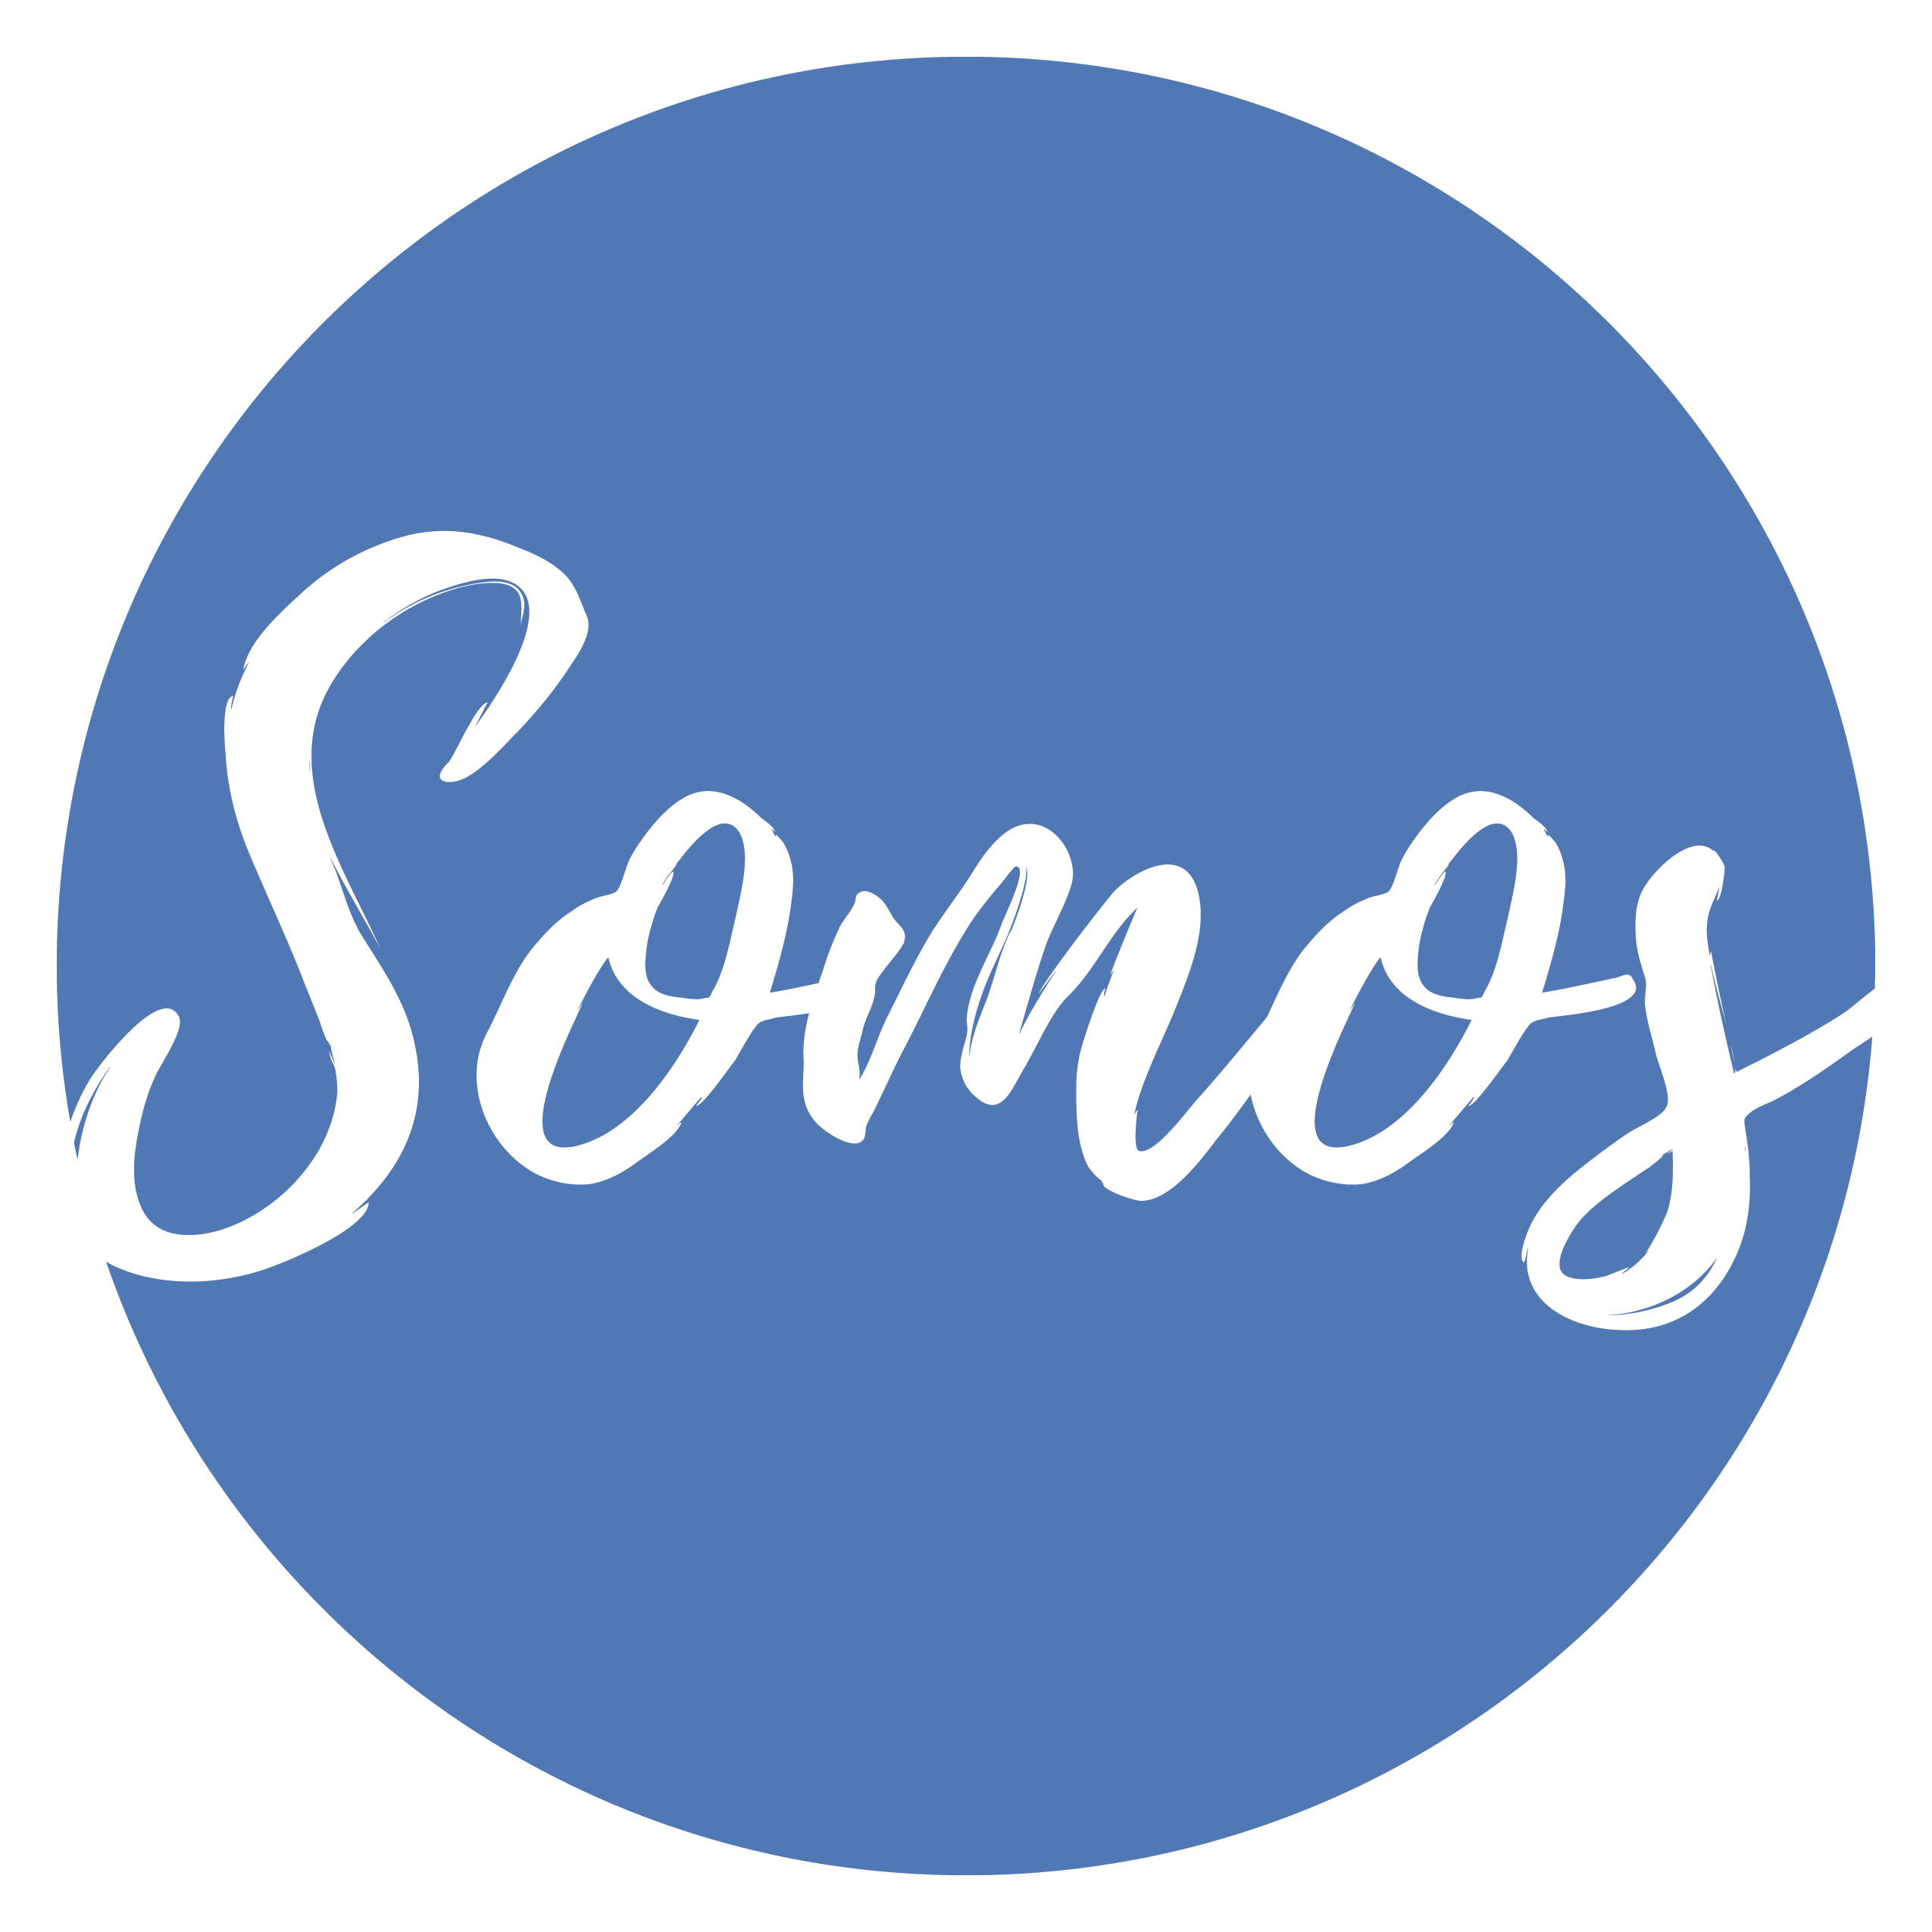 SOMOS Blue Circle Logo